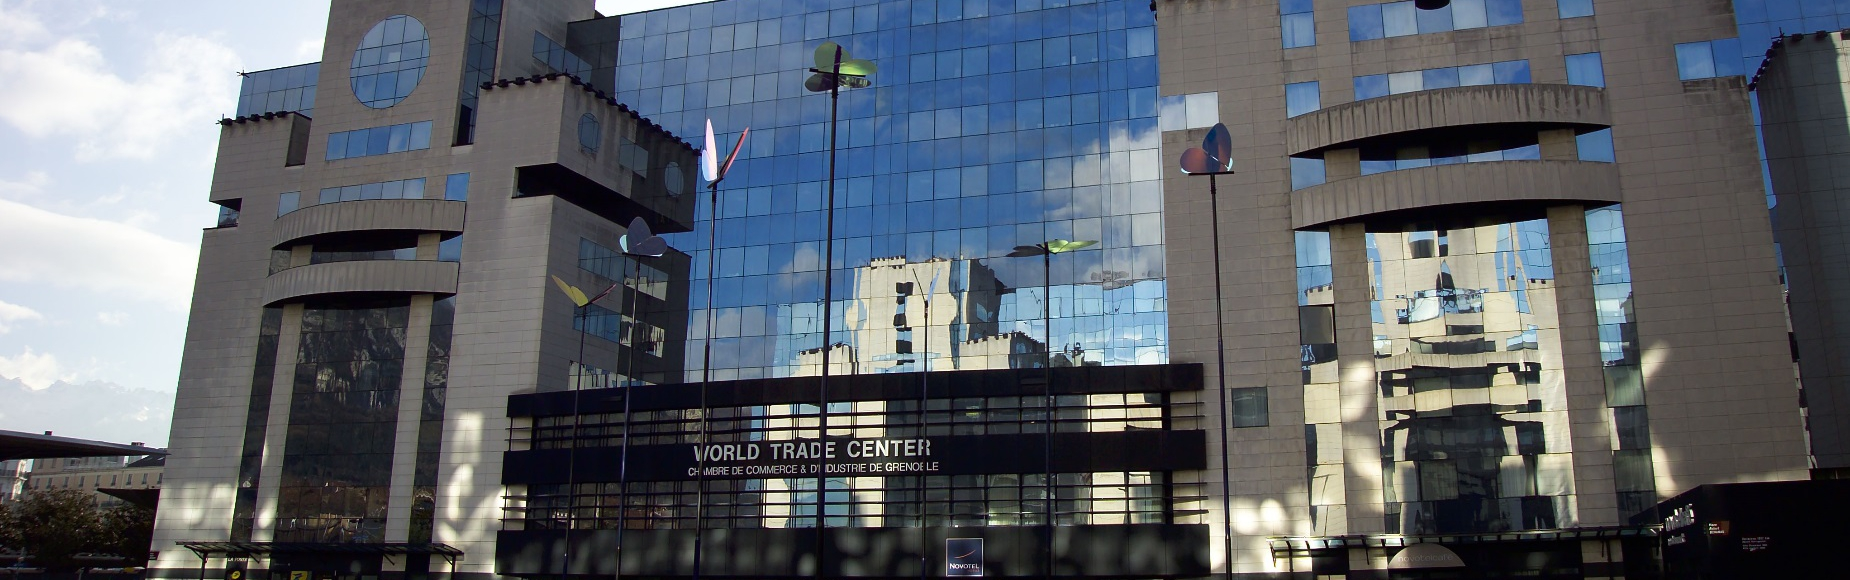 Grenoble WTC congress center